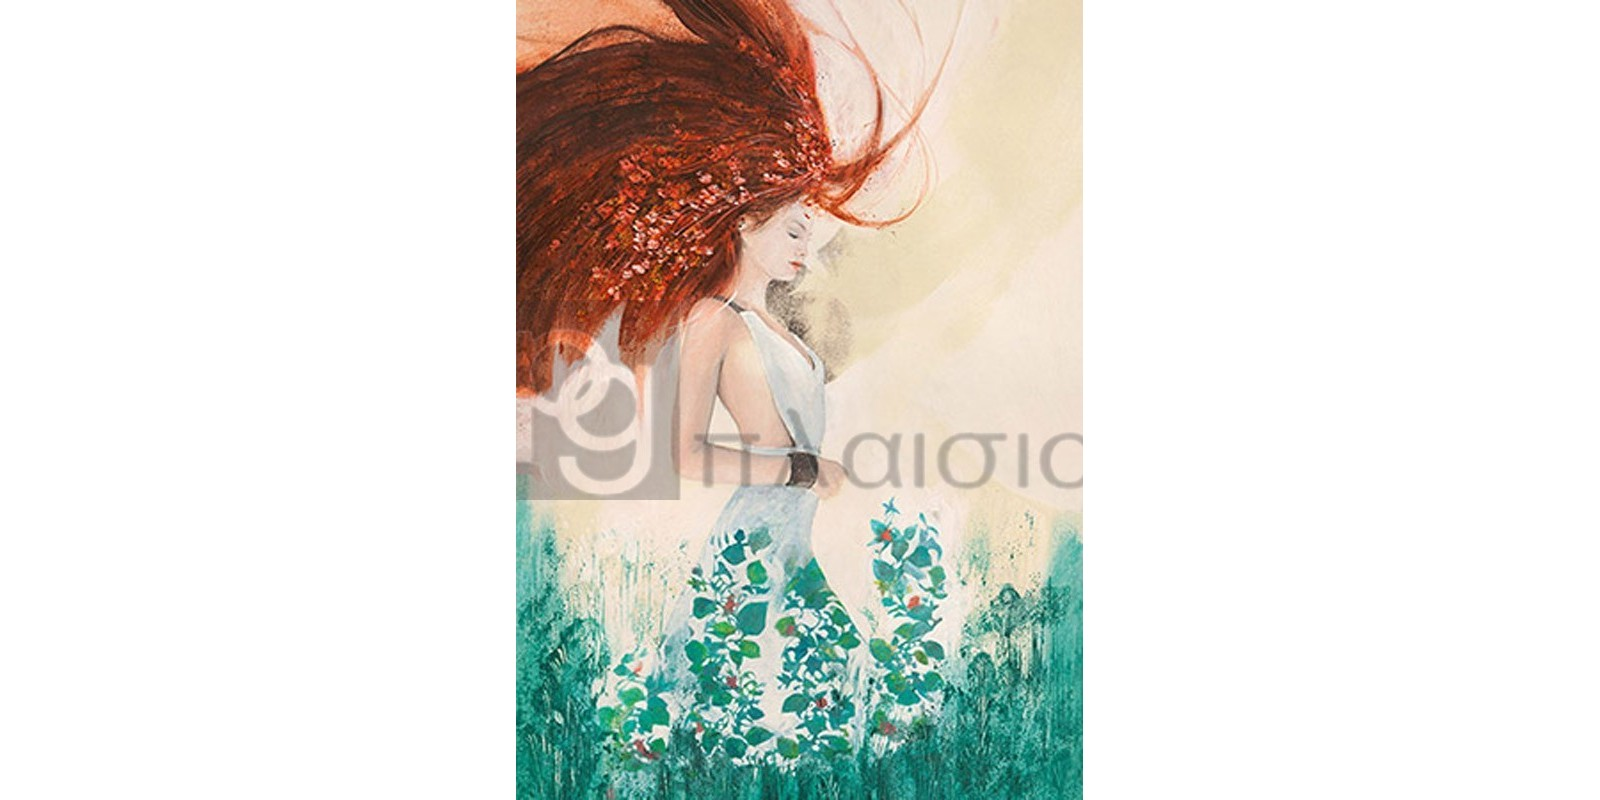 ERICA PAGNONI - Fairy of Spring